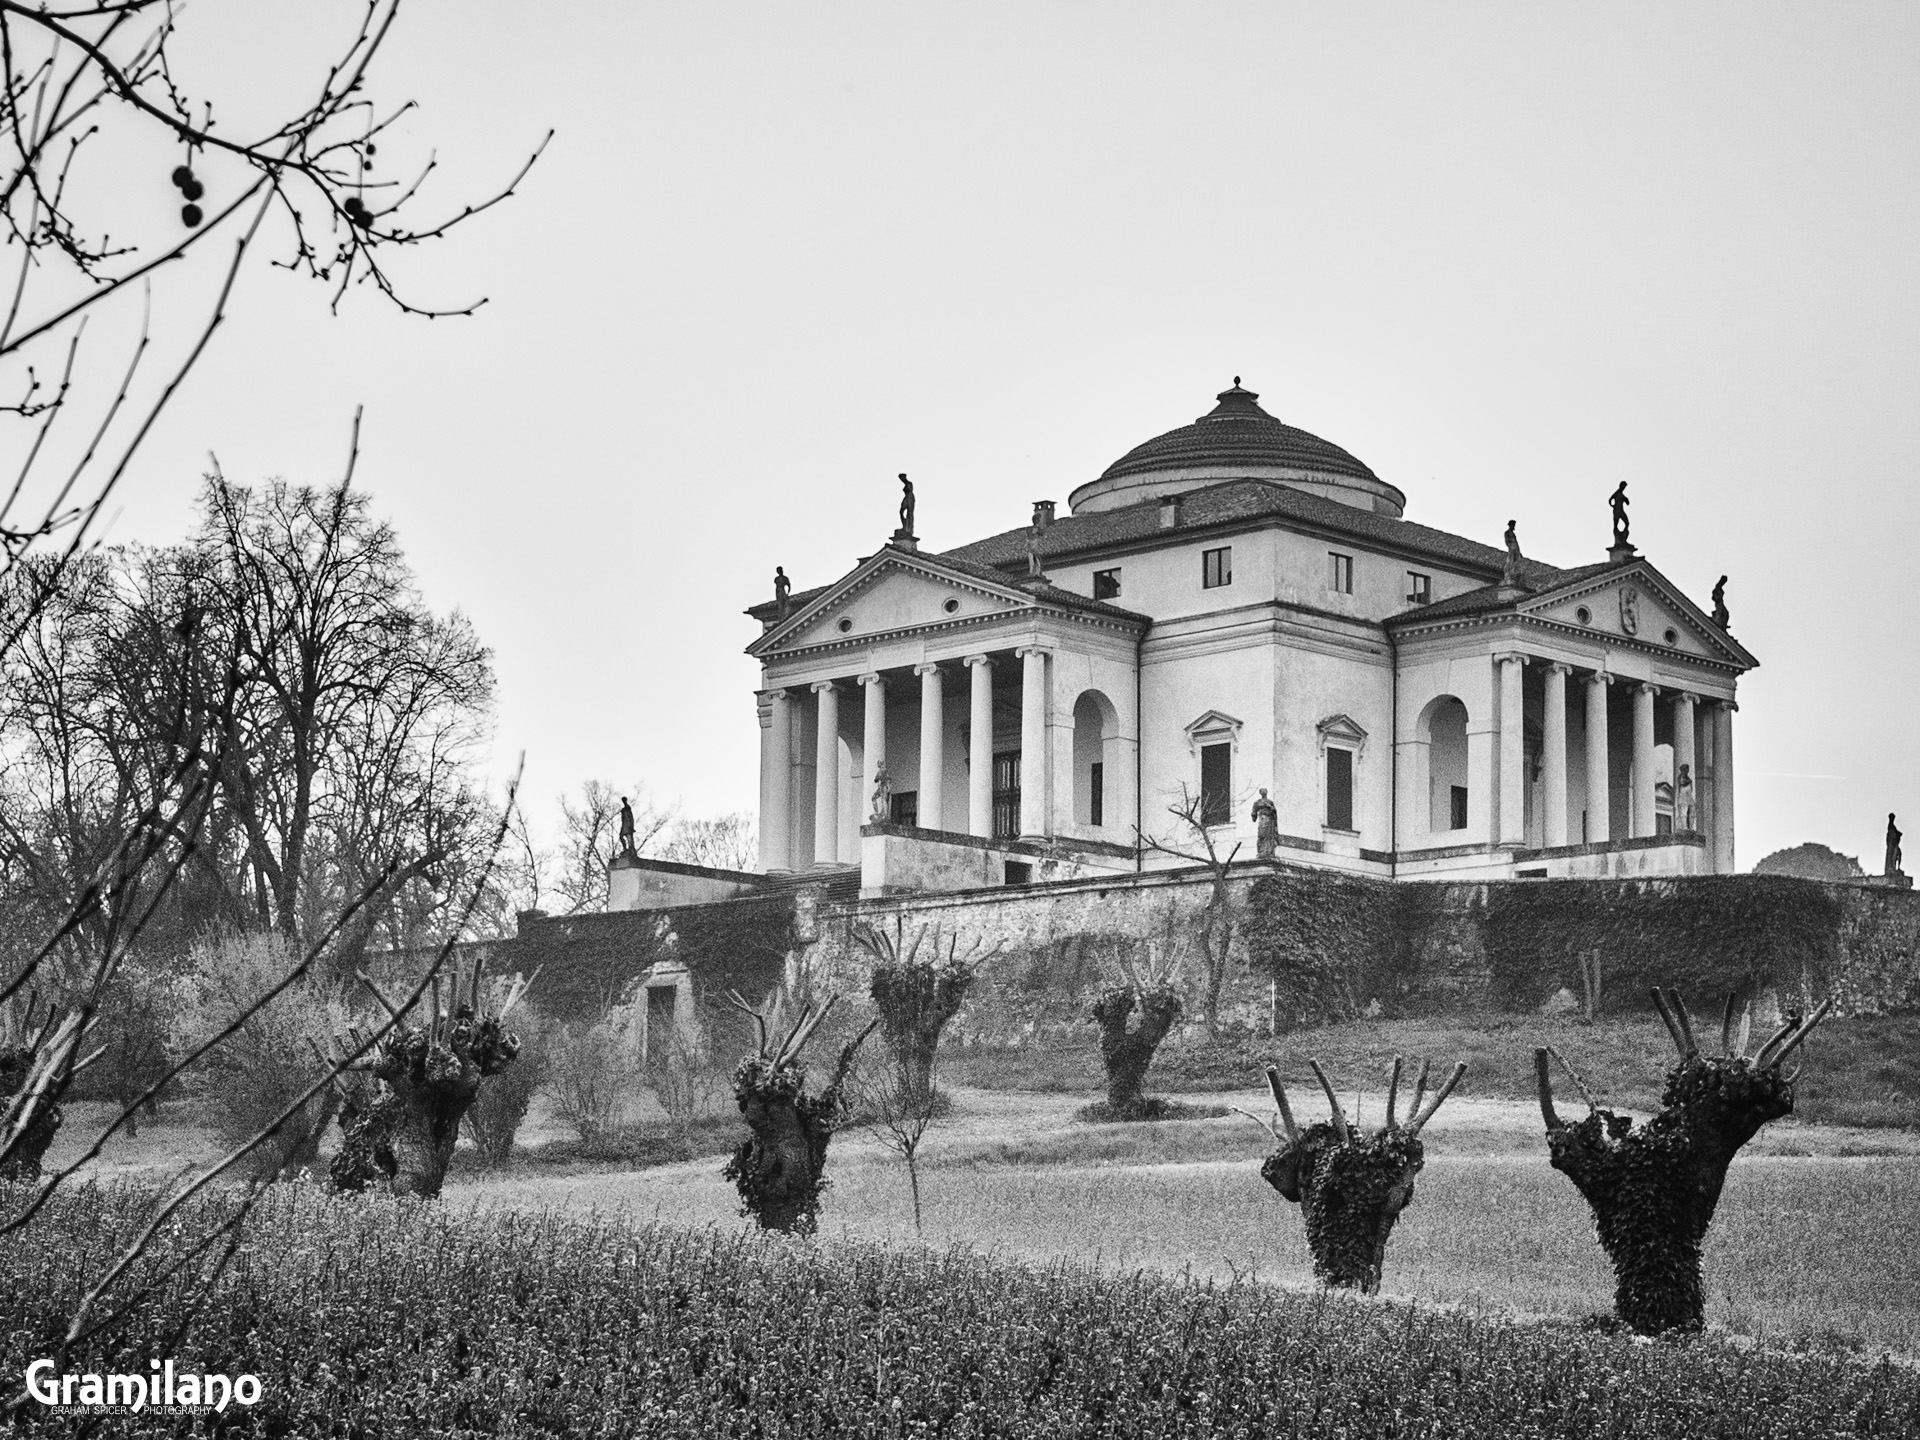 Palladio's Villa La Rotonda, Vicenza